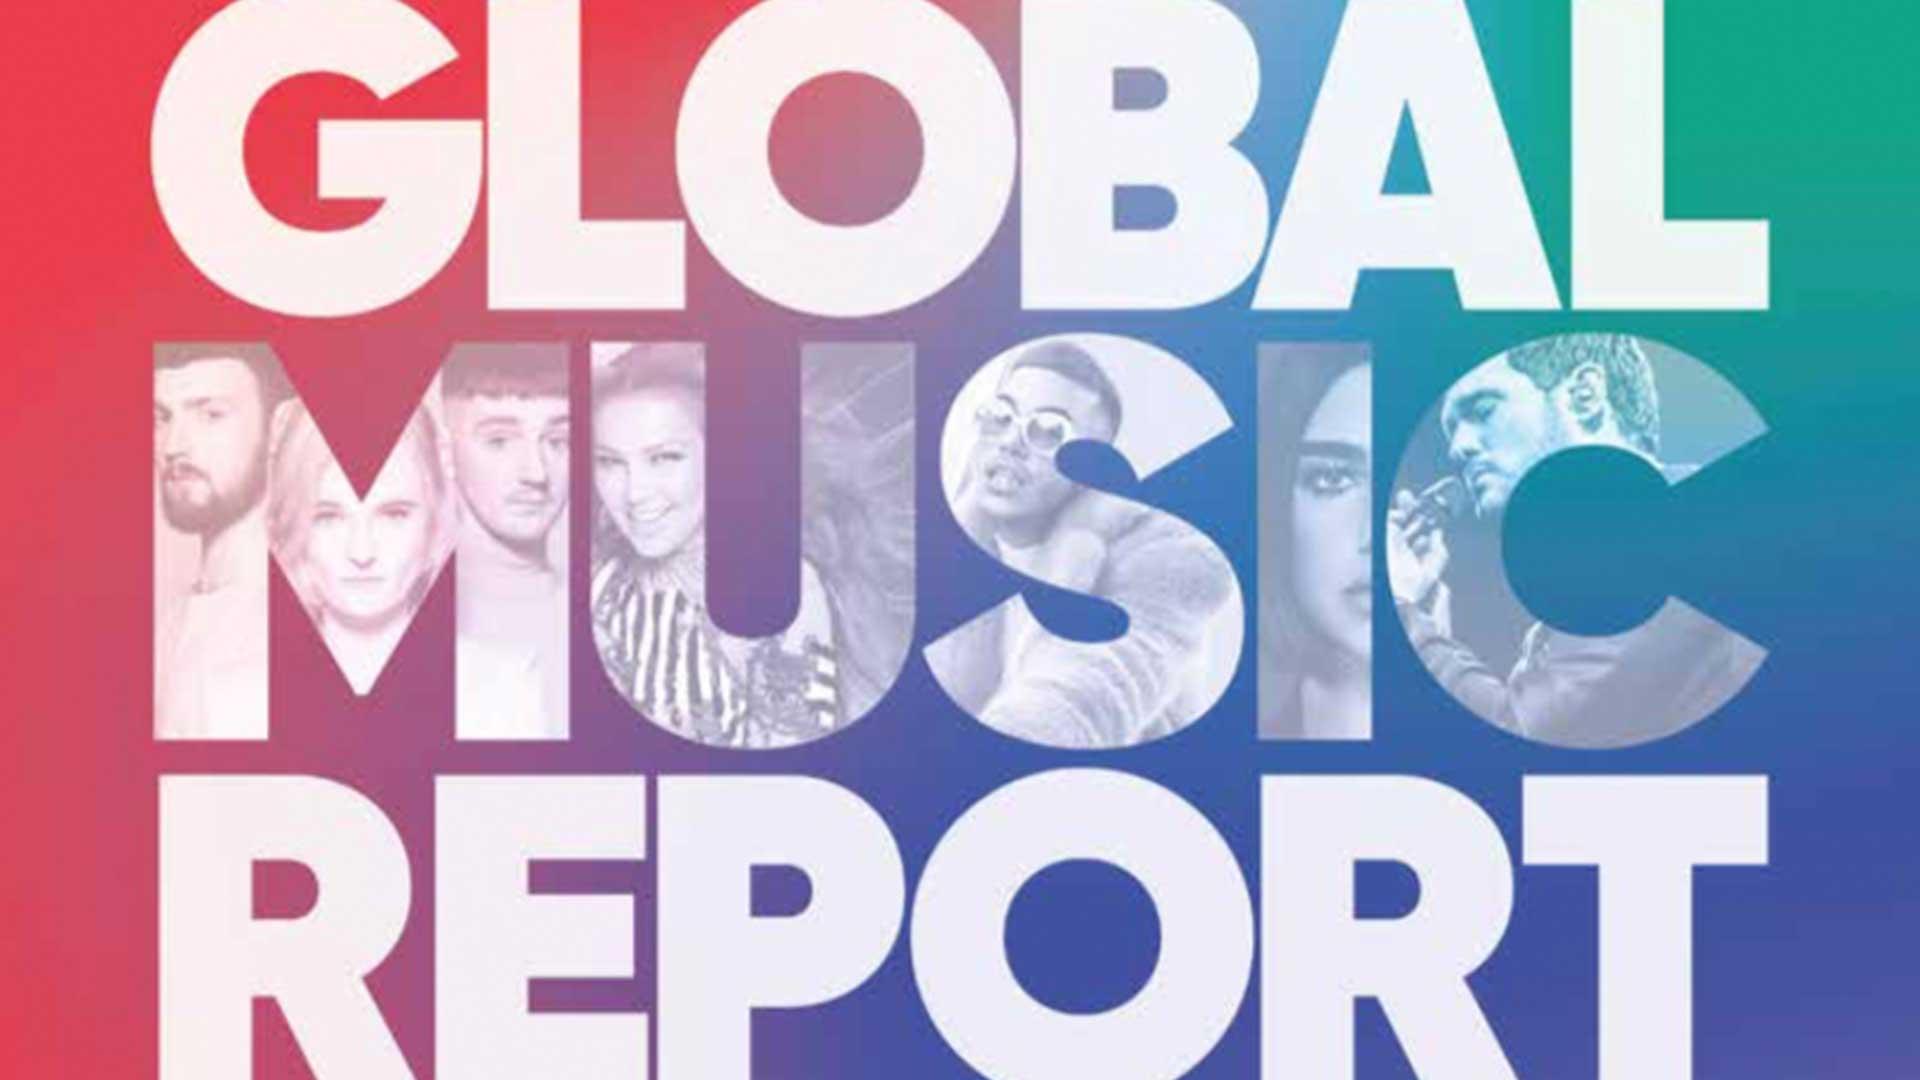 Fairness Rocks News IFPI Global Music Report 2019